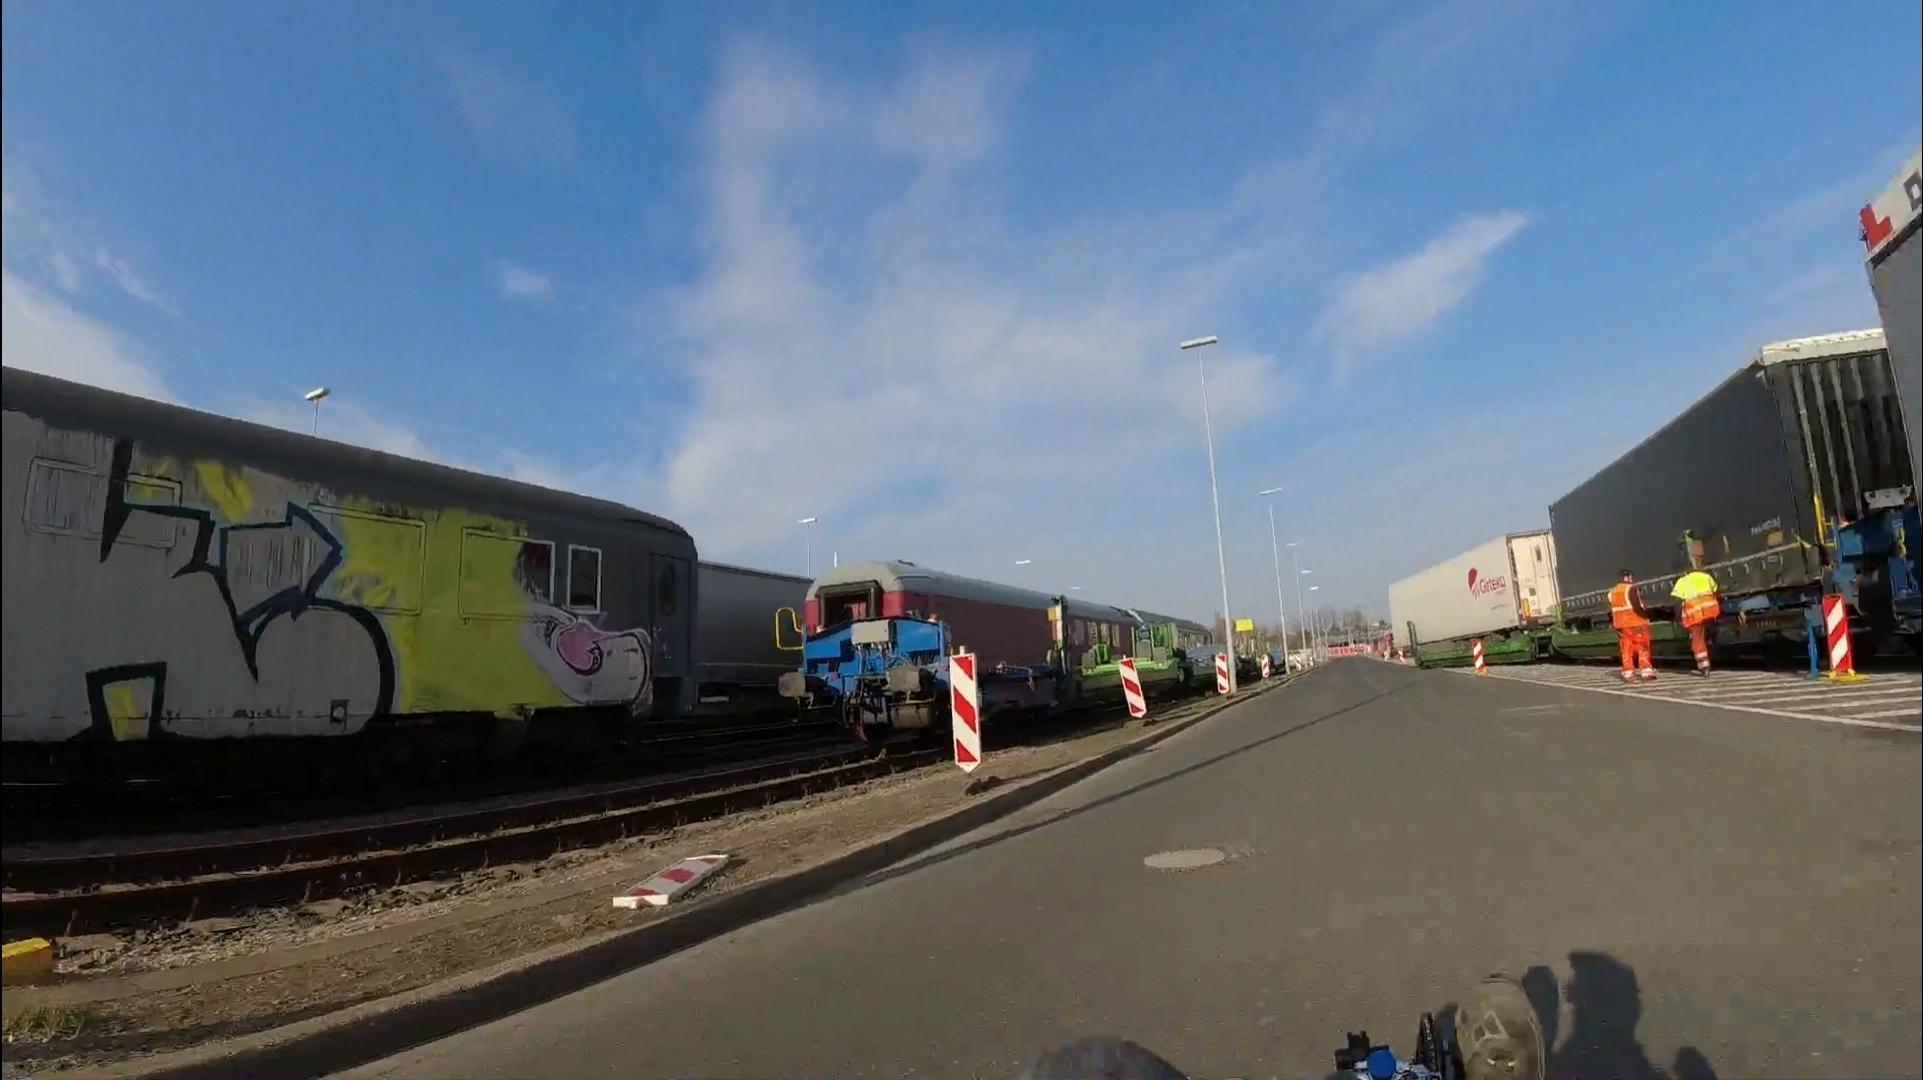 #Düsseldorf, #Zons, #Fähre, #Reisholz, #Bahn, #Kunst, #Graffiti, #Waggon,